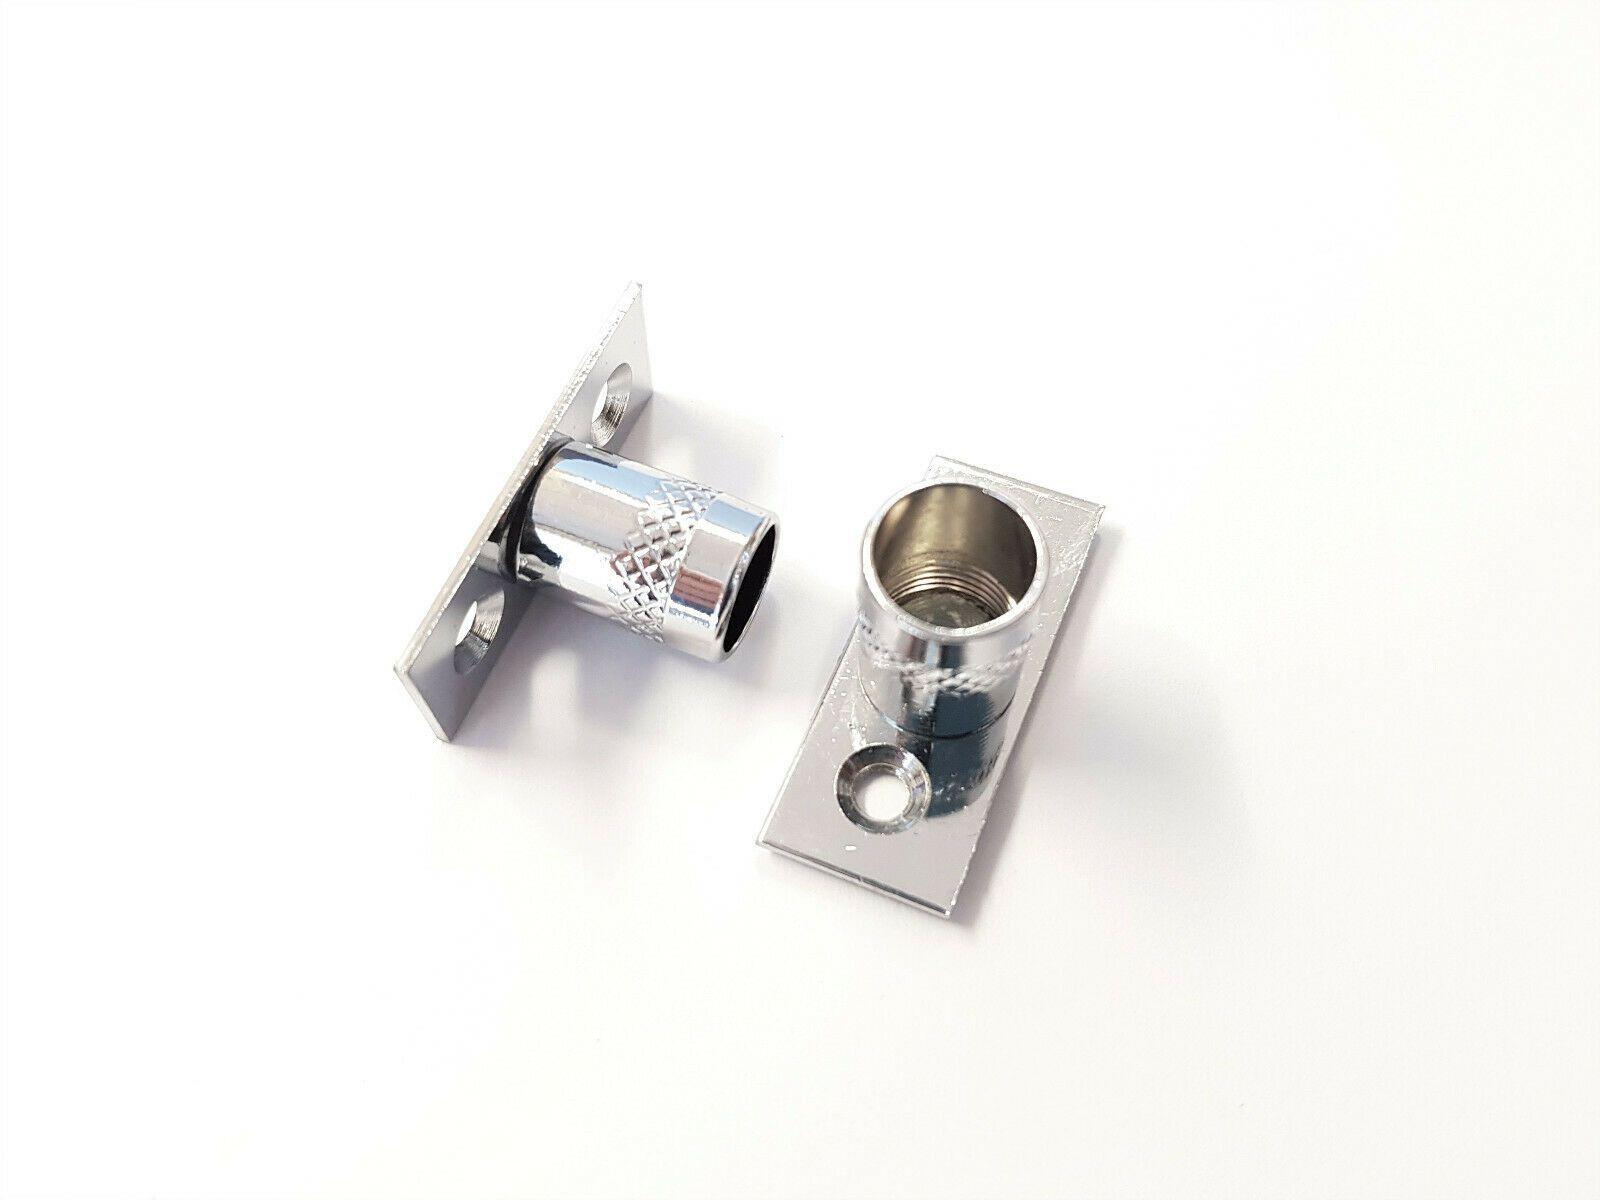 2 chrome curtain rod recess brackets 10mm pole support brackets net voile socket